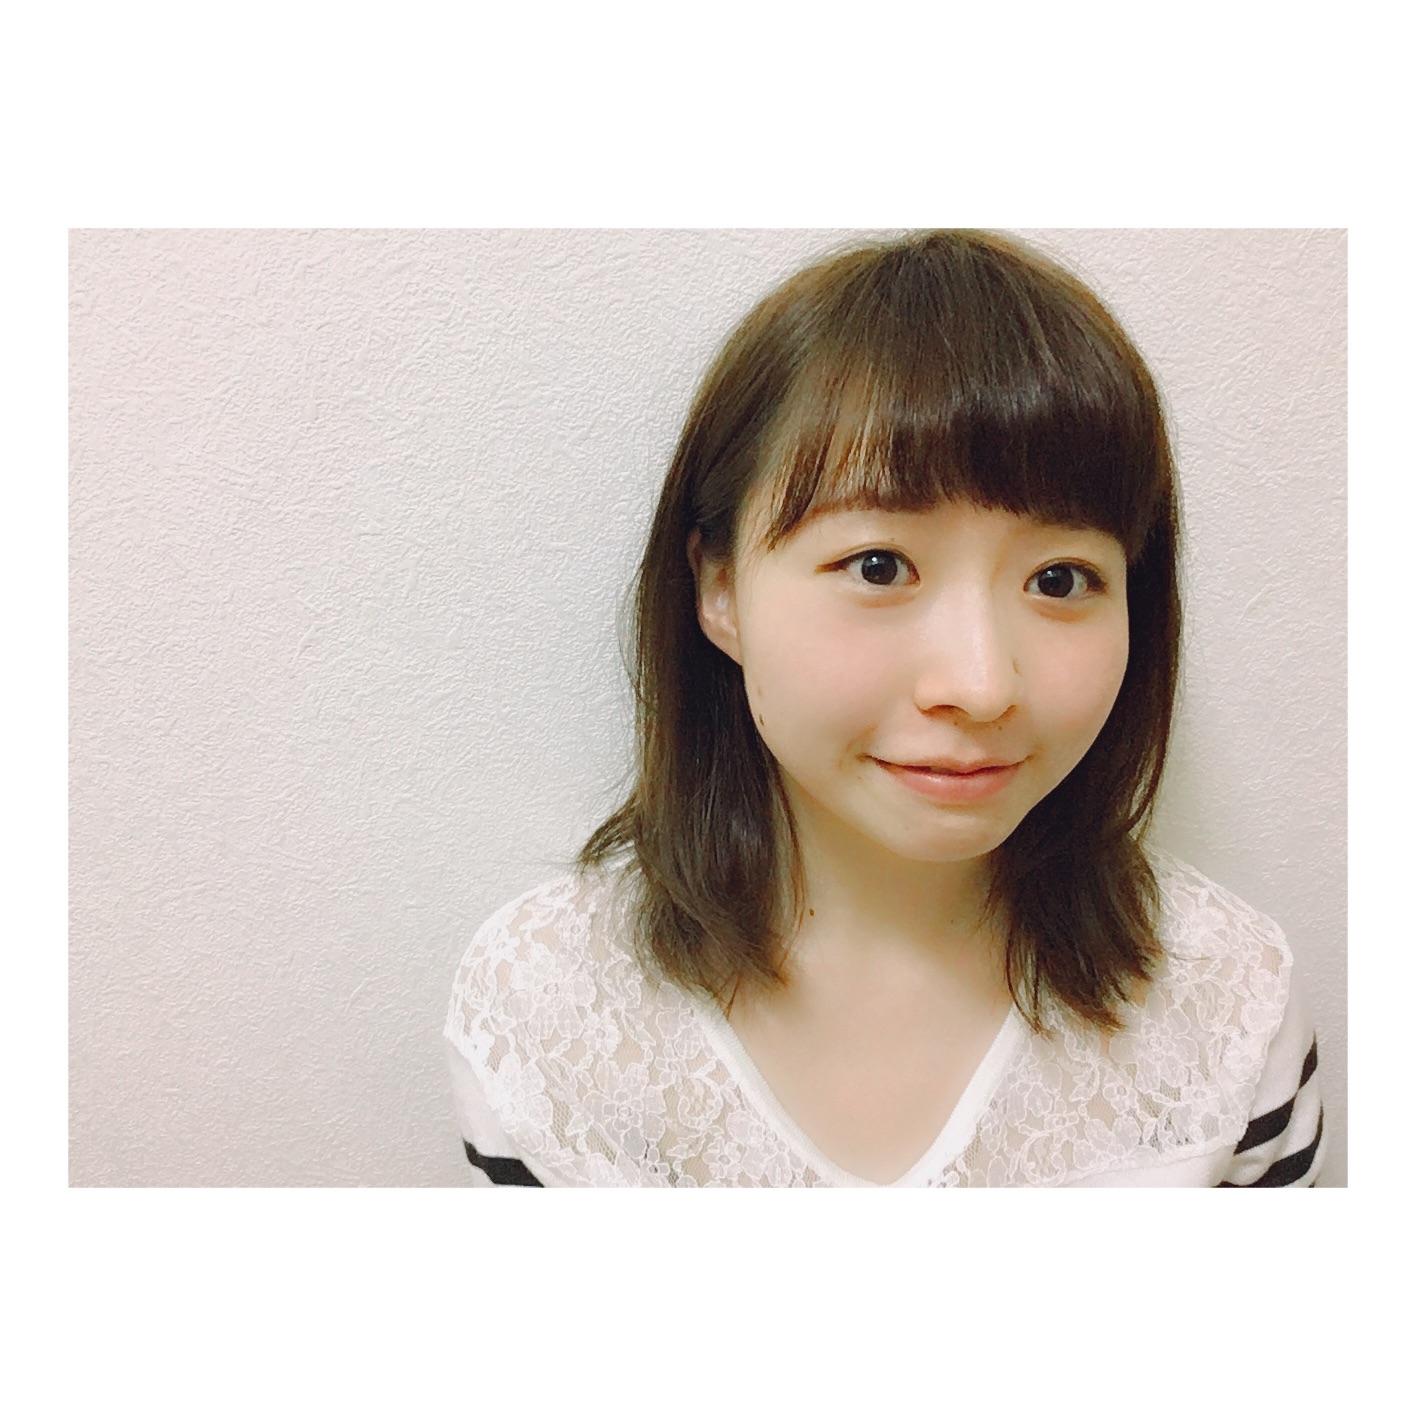 f:id:saitomayu:20160821215538j:image